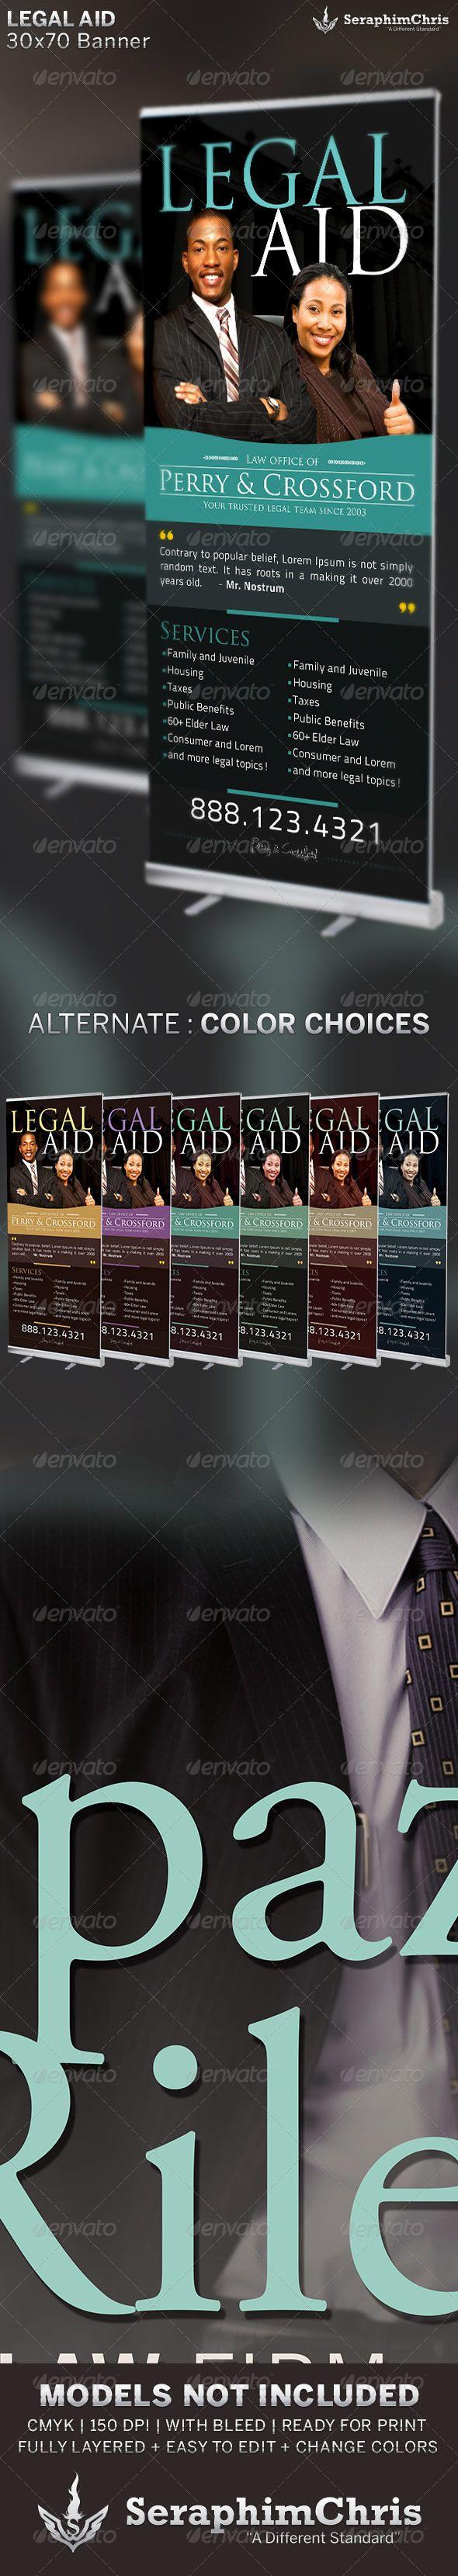 1c473c890759c634d1031420a63dd5b2 - Legal Aid Panel Application Website